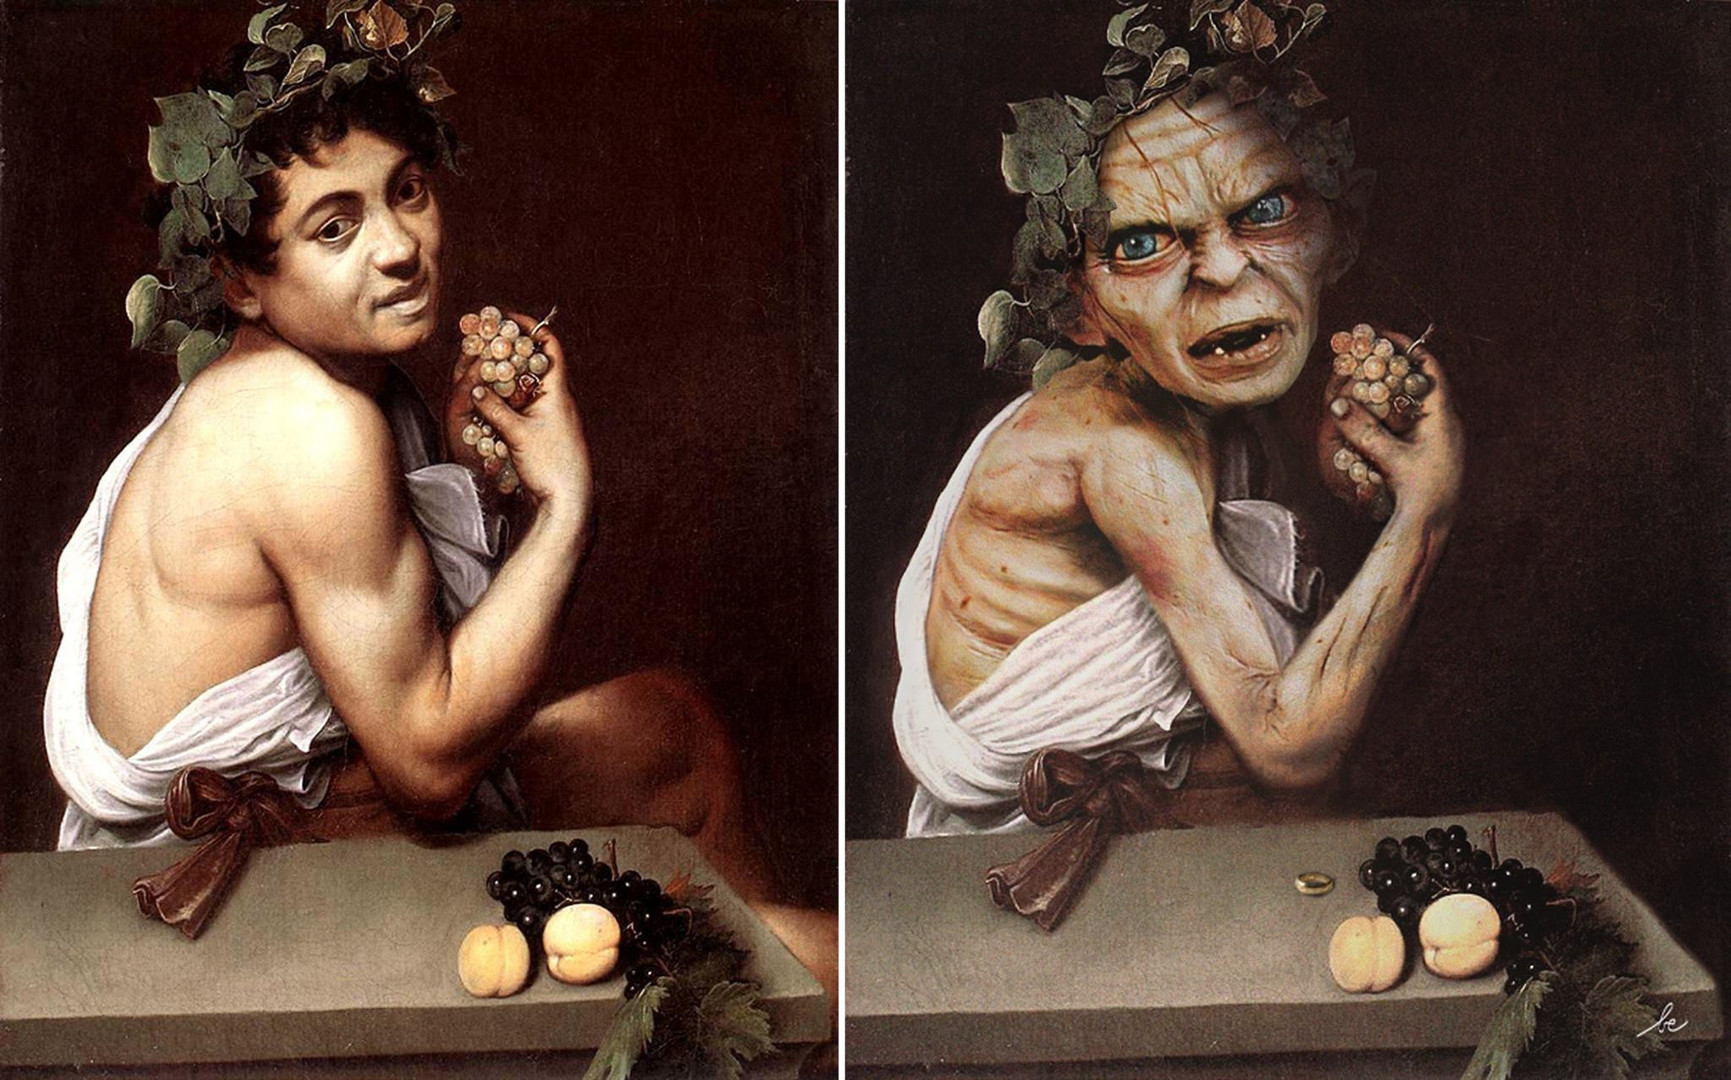 Gollum VS Le Jeune Bacchus malade, de Le Caravage